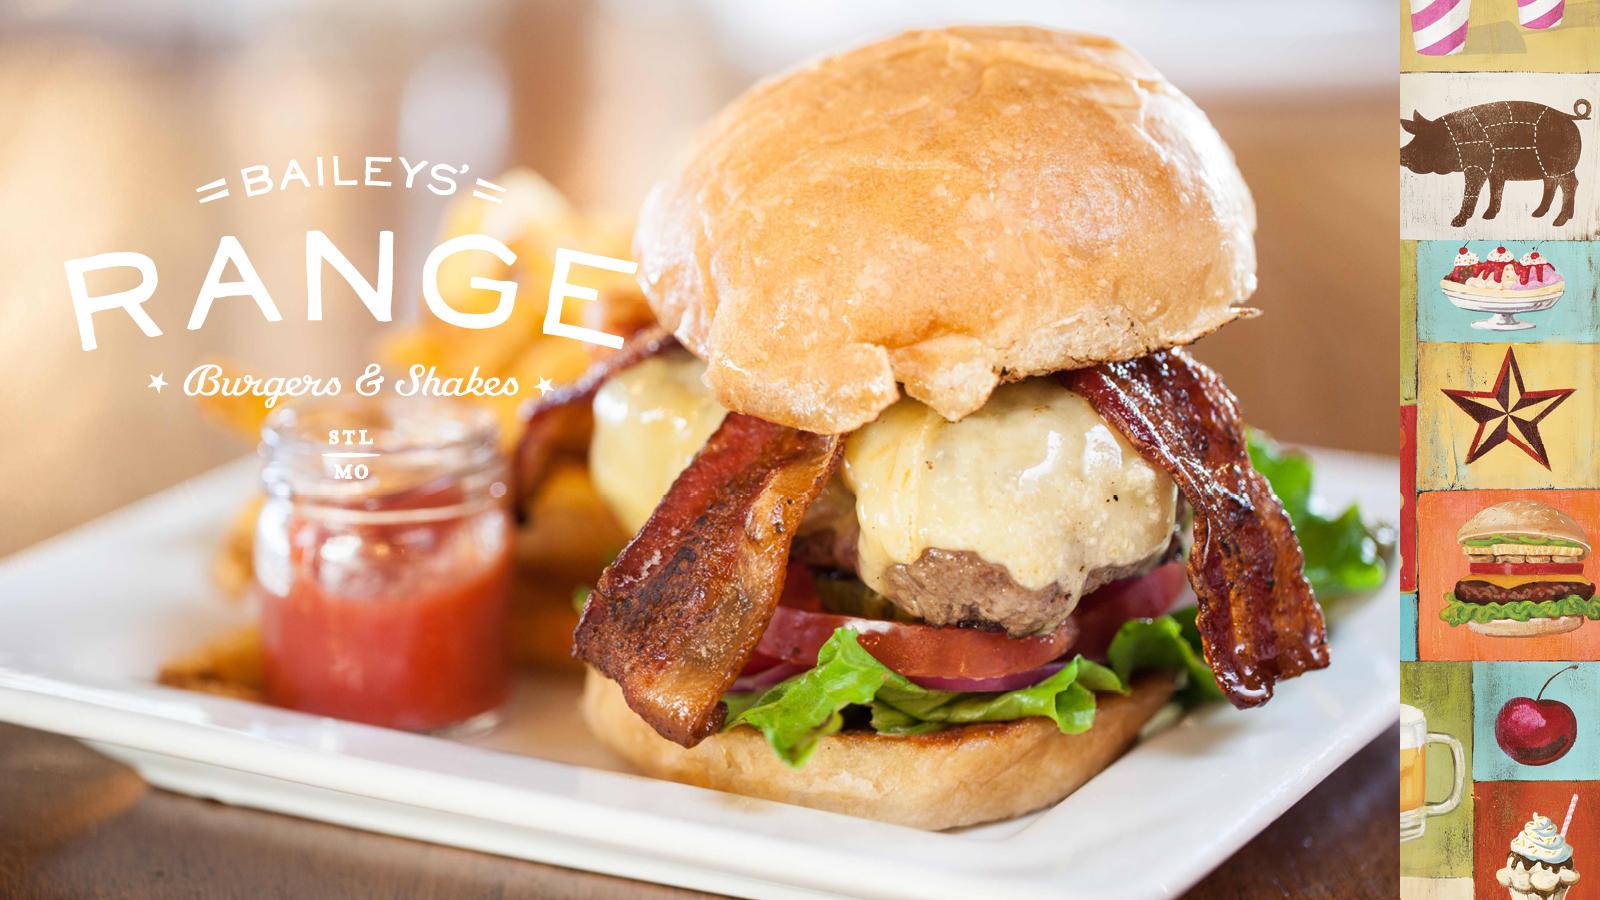 Baileys' Range Burger with Logo and Branding